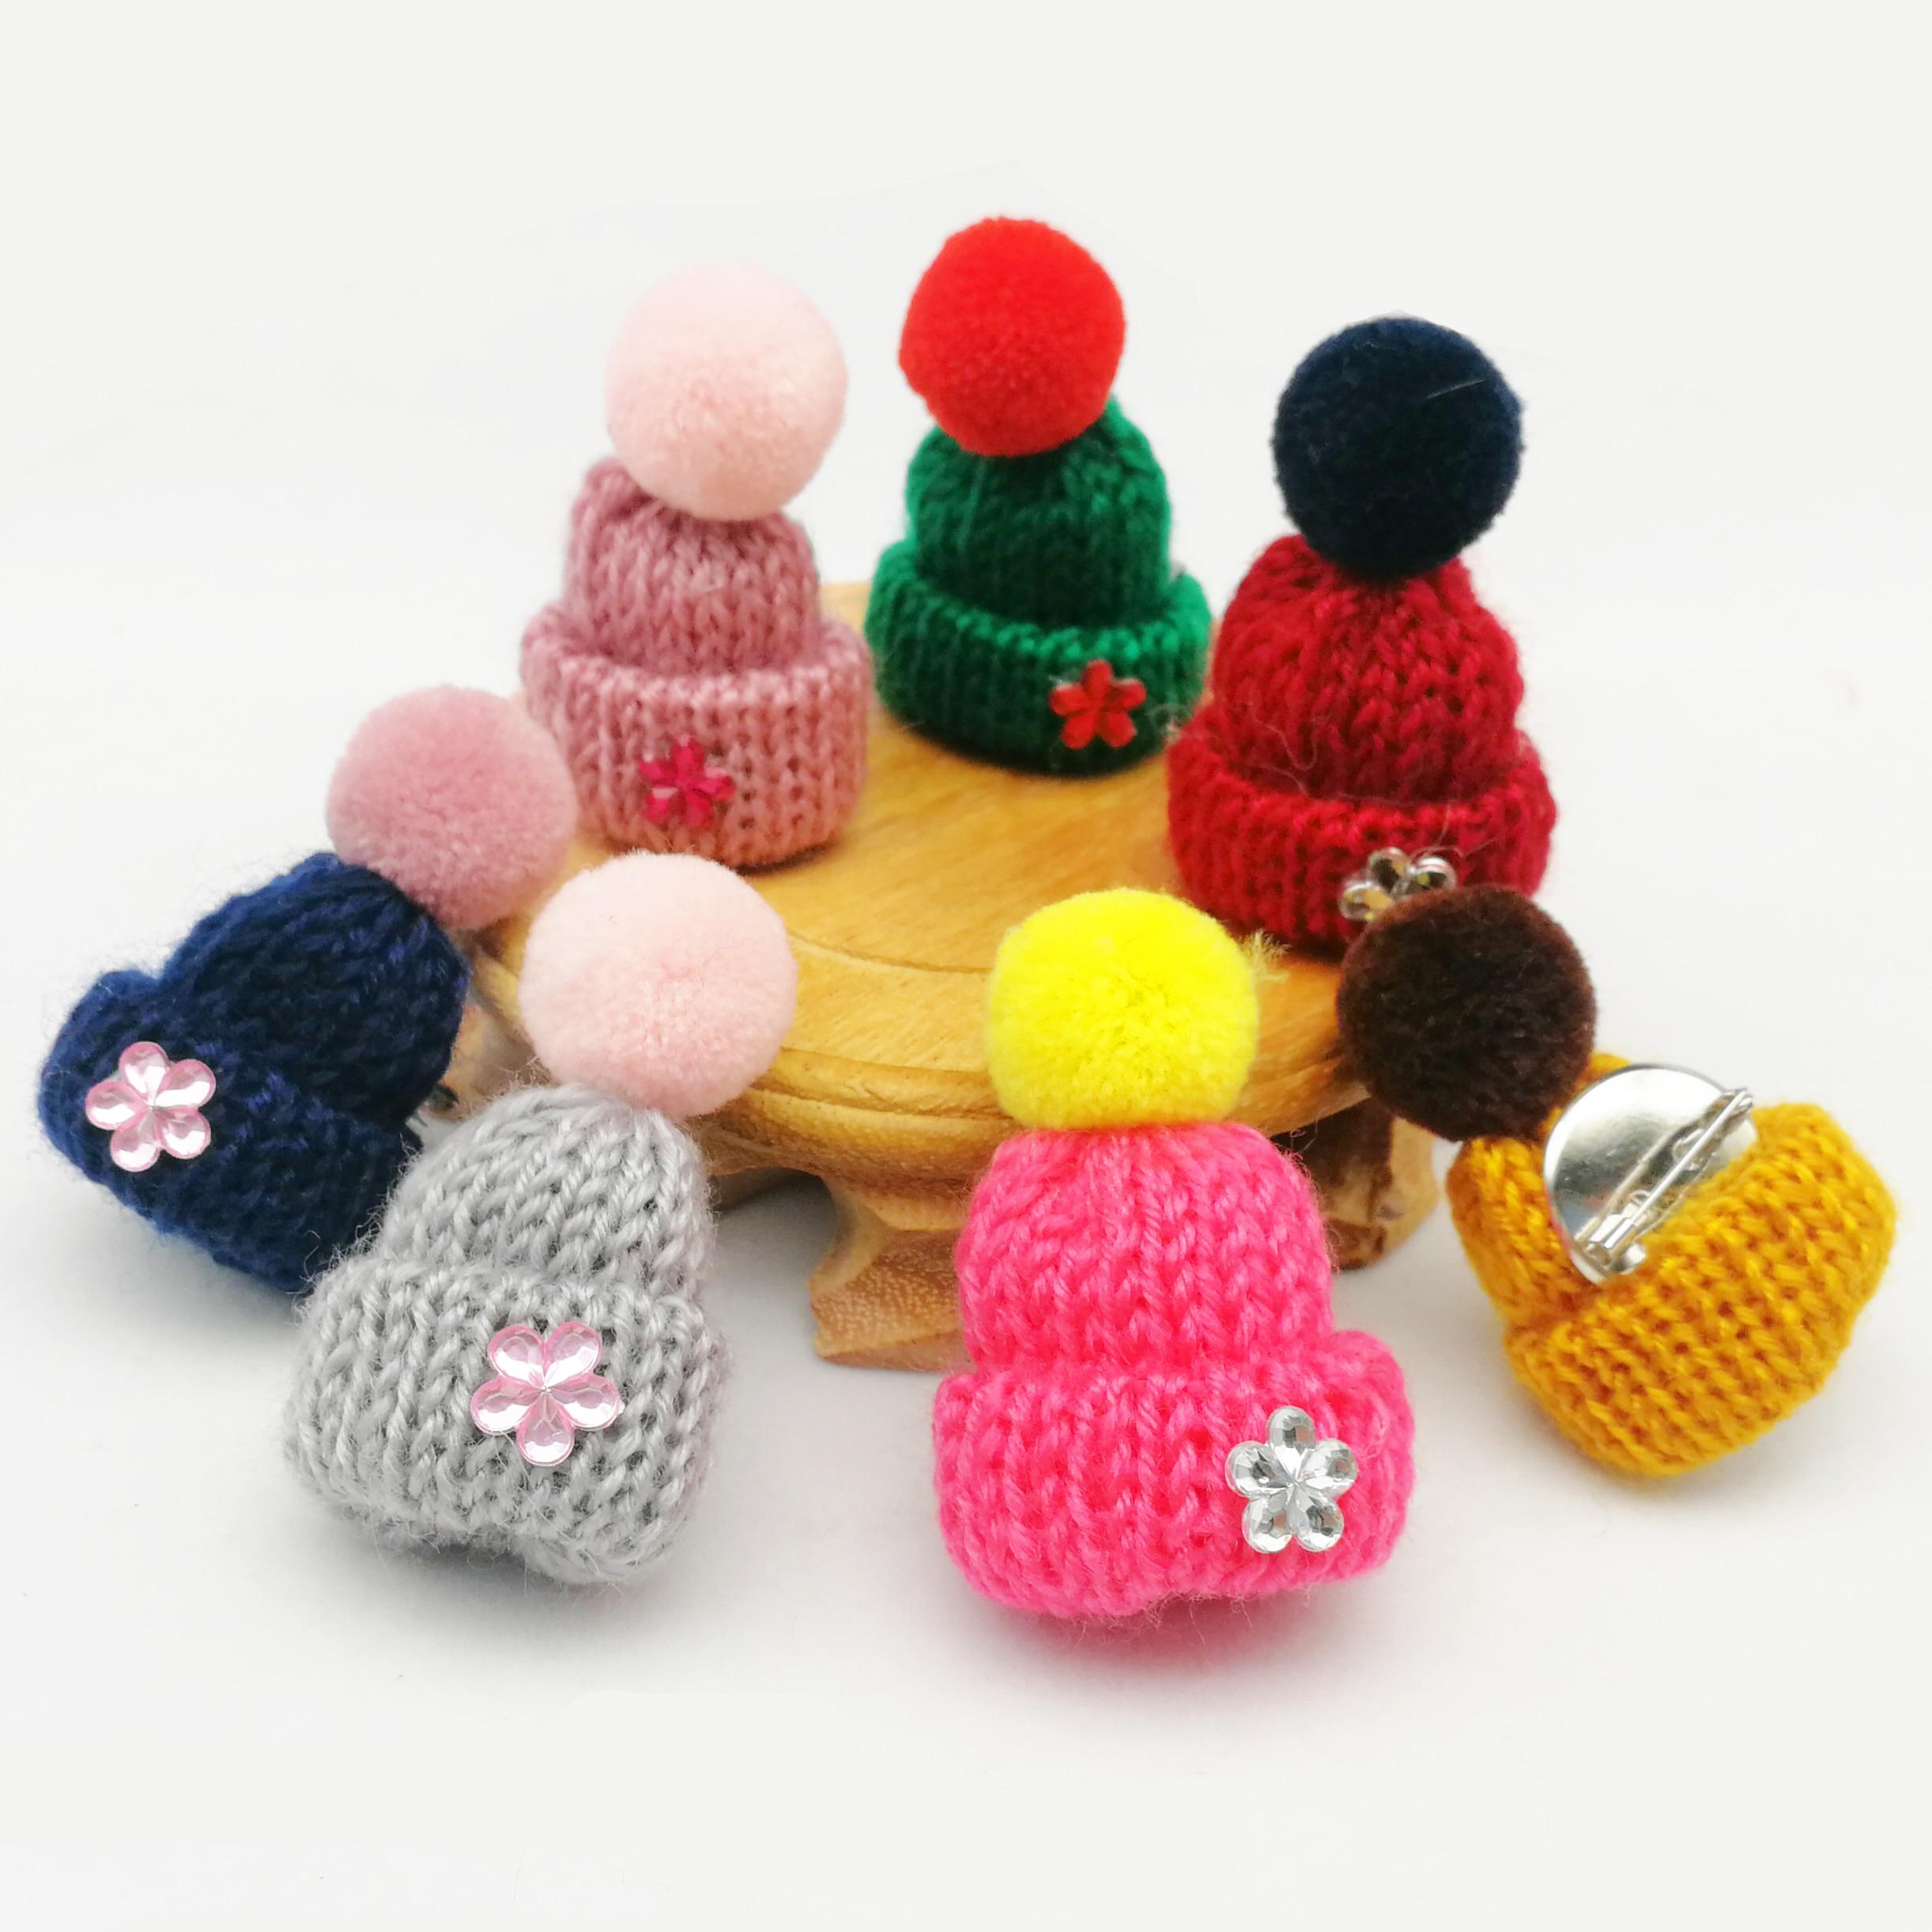 Bonito Mini Malha Hairball Chapéu Camisola Broche Pinos Crachá Colarinho Roupas Acessórios Criativo Cristal Pin Broches para As Mulheres